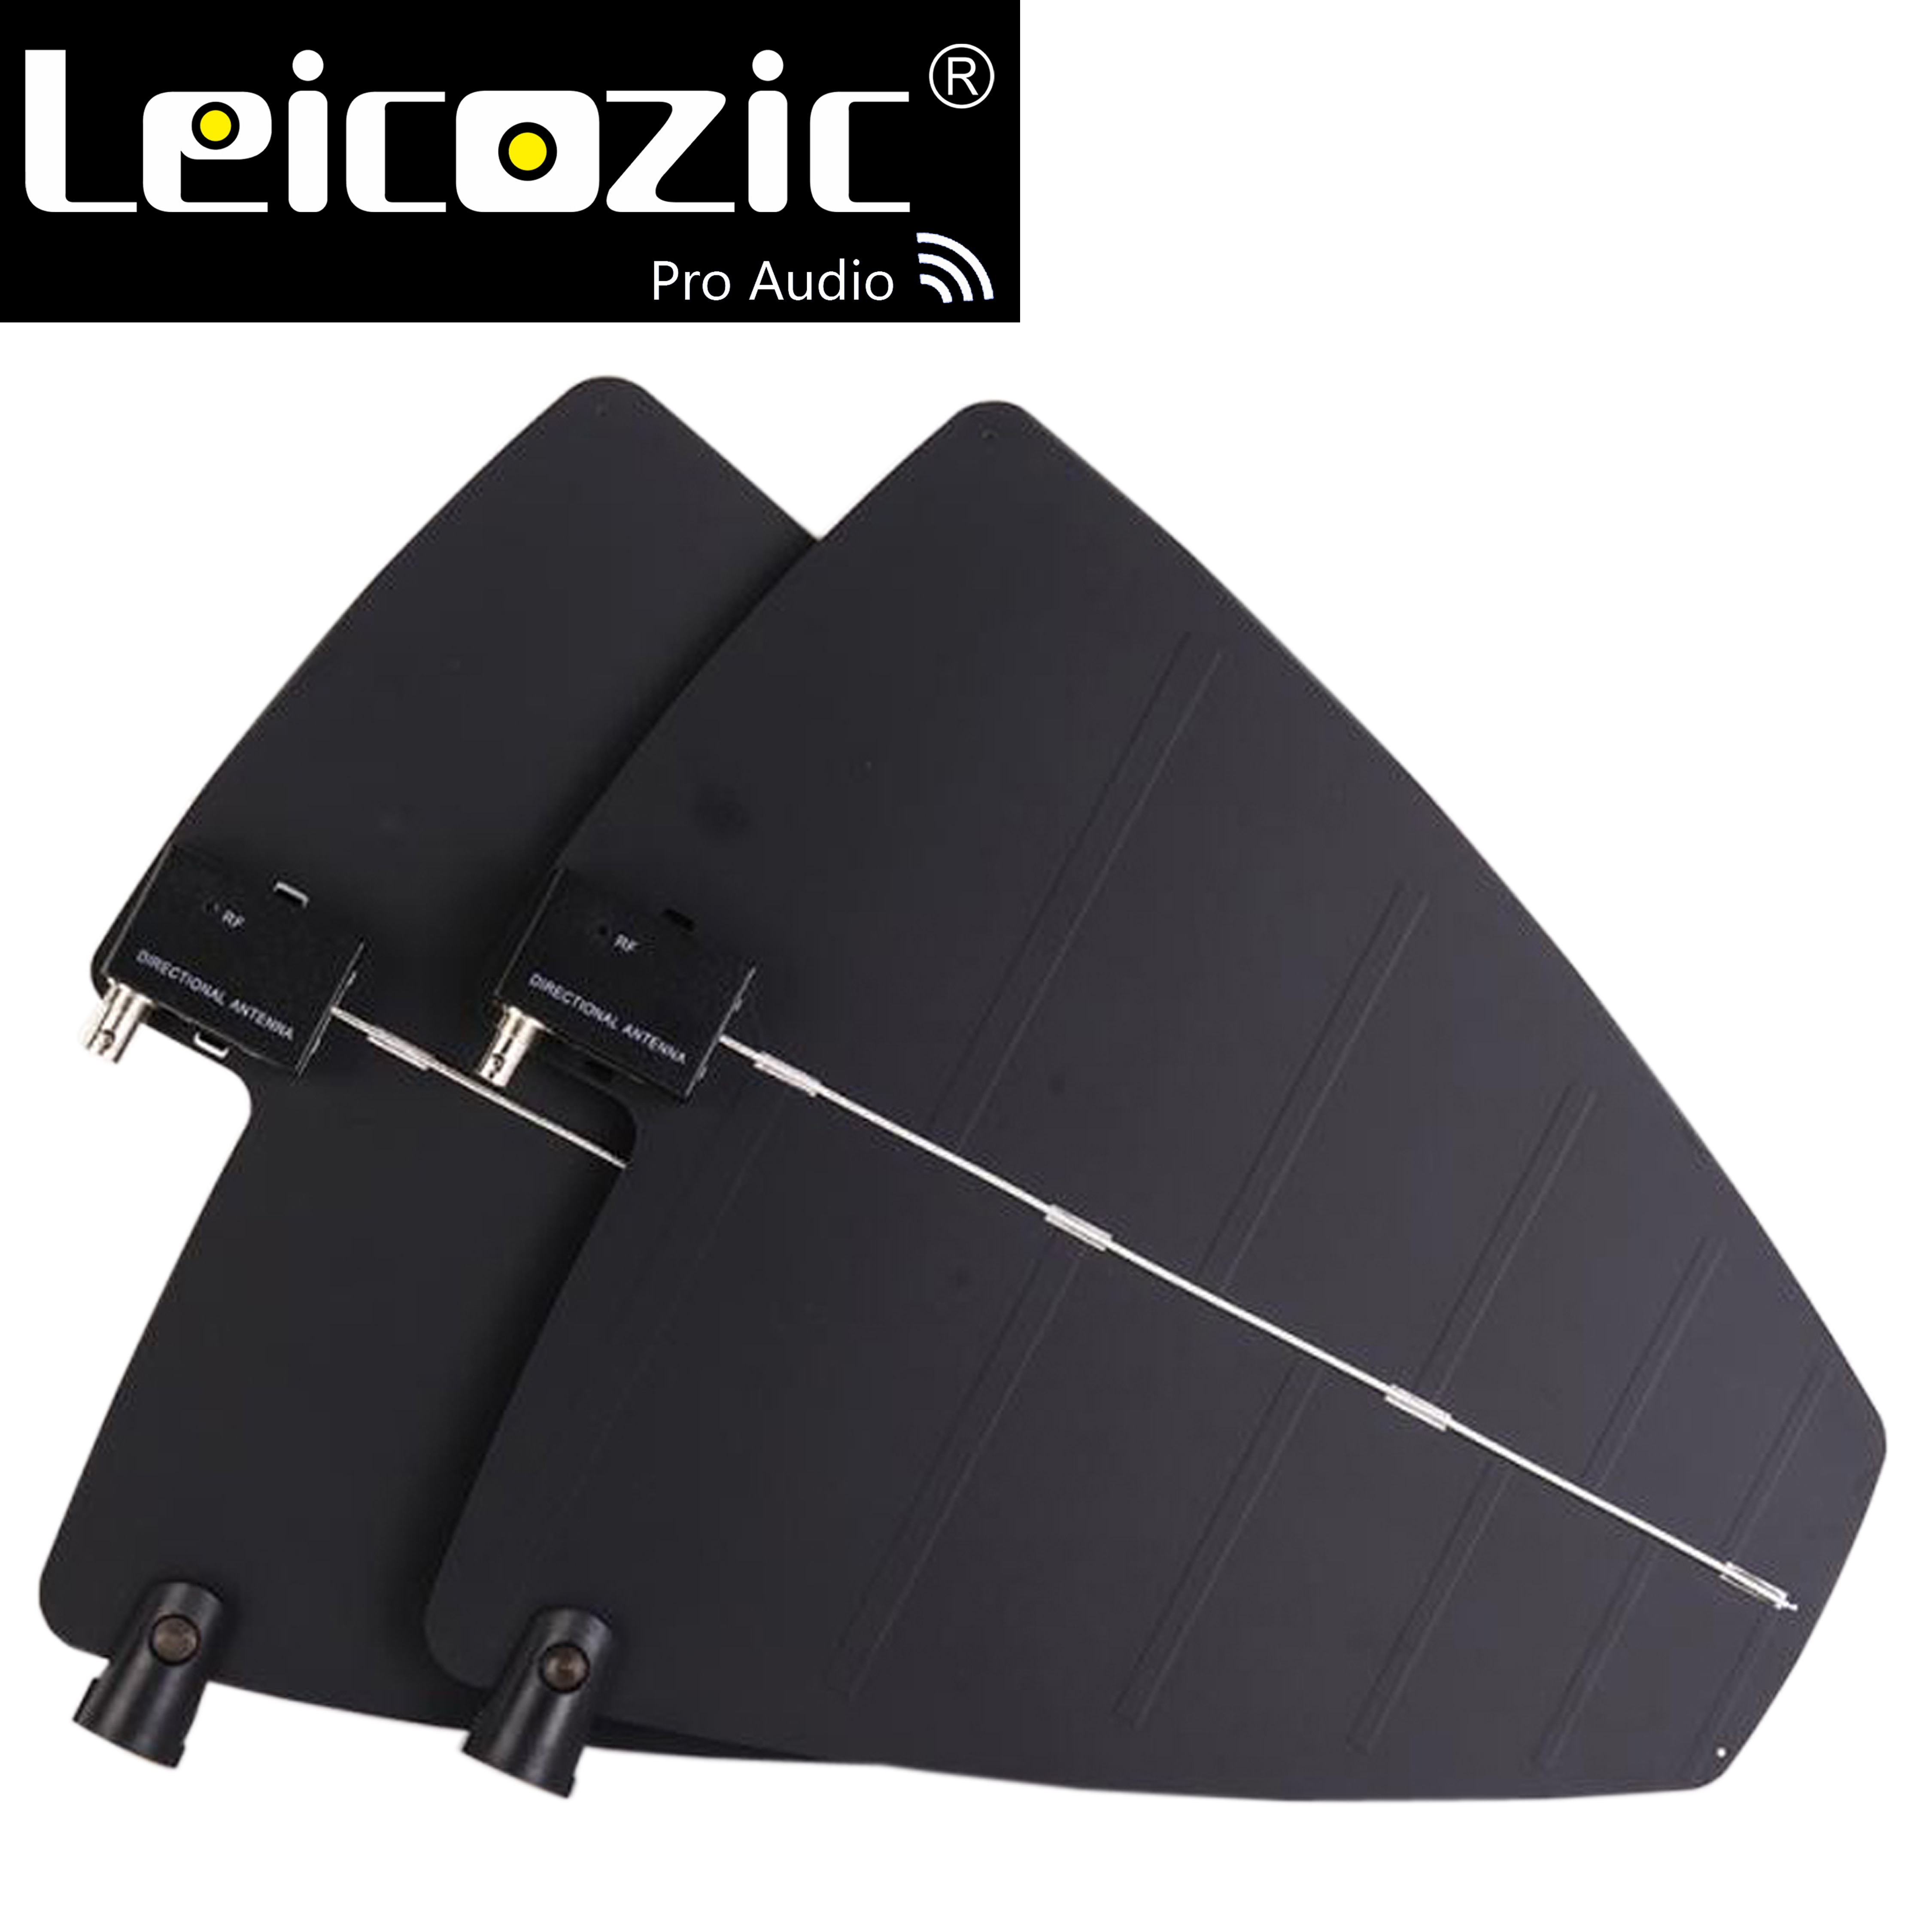 Leicozic-مجموعة مضخمات هوائي UHF لميكروفون UHF اللاسلكي ، مجموعة من 2 ، 890